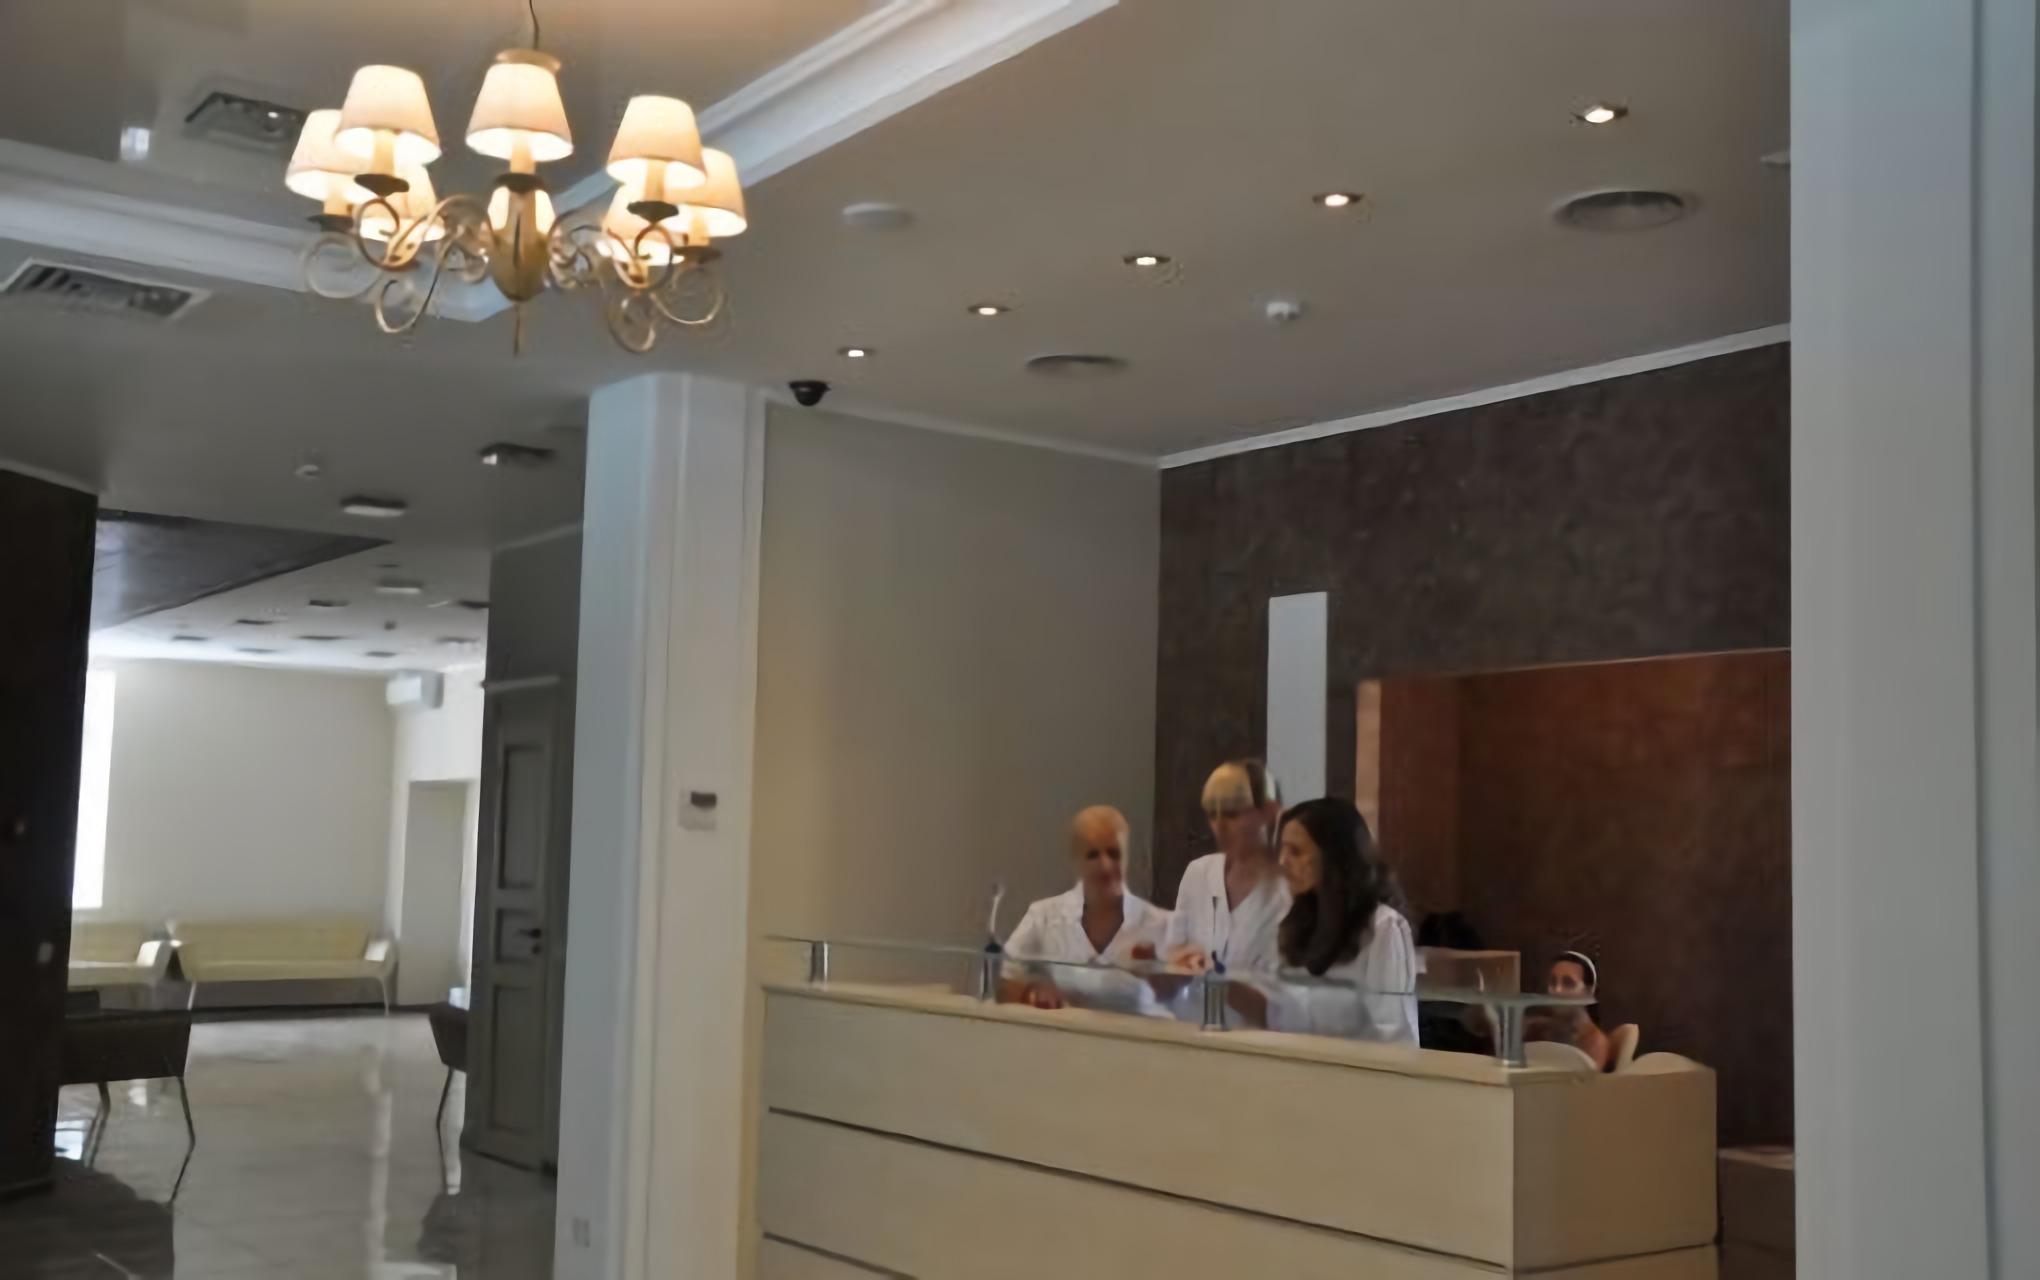 Reception of Novy Zir Clinic in Kharkiv